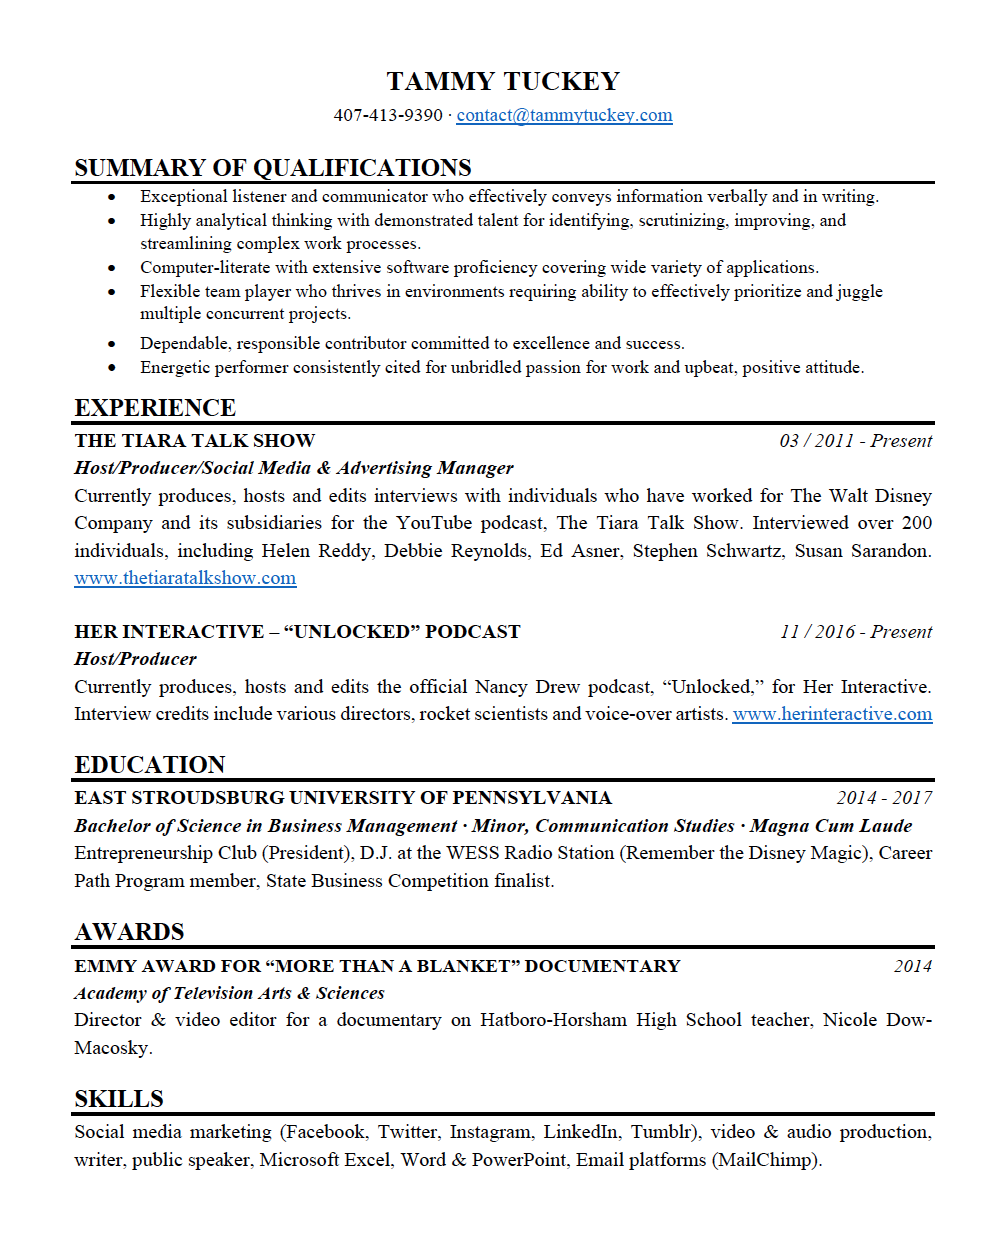 Tammy Tuckey - Resume - Page 1